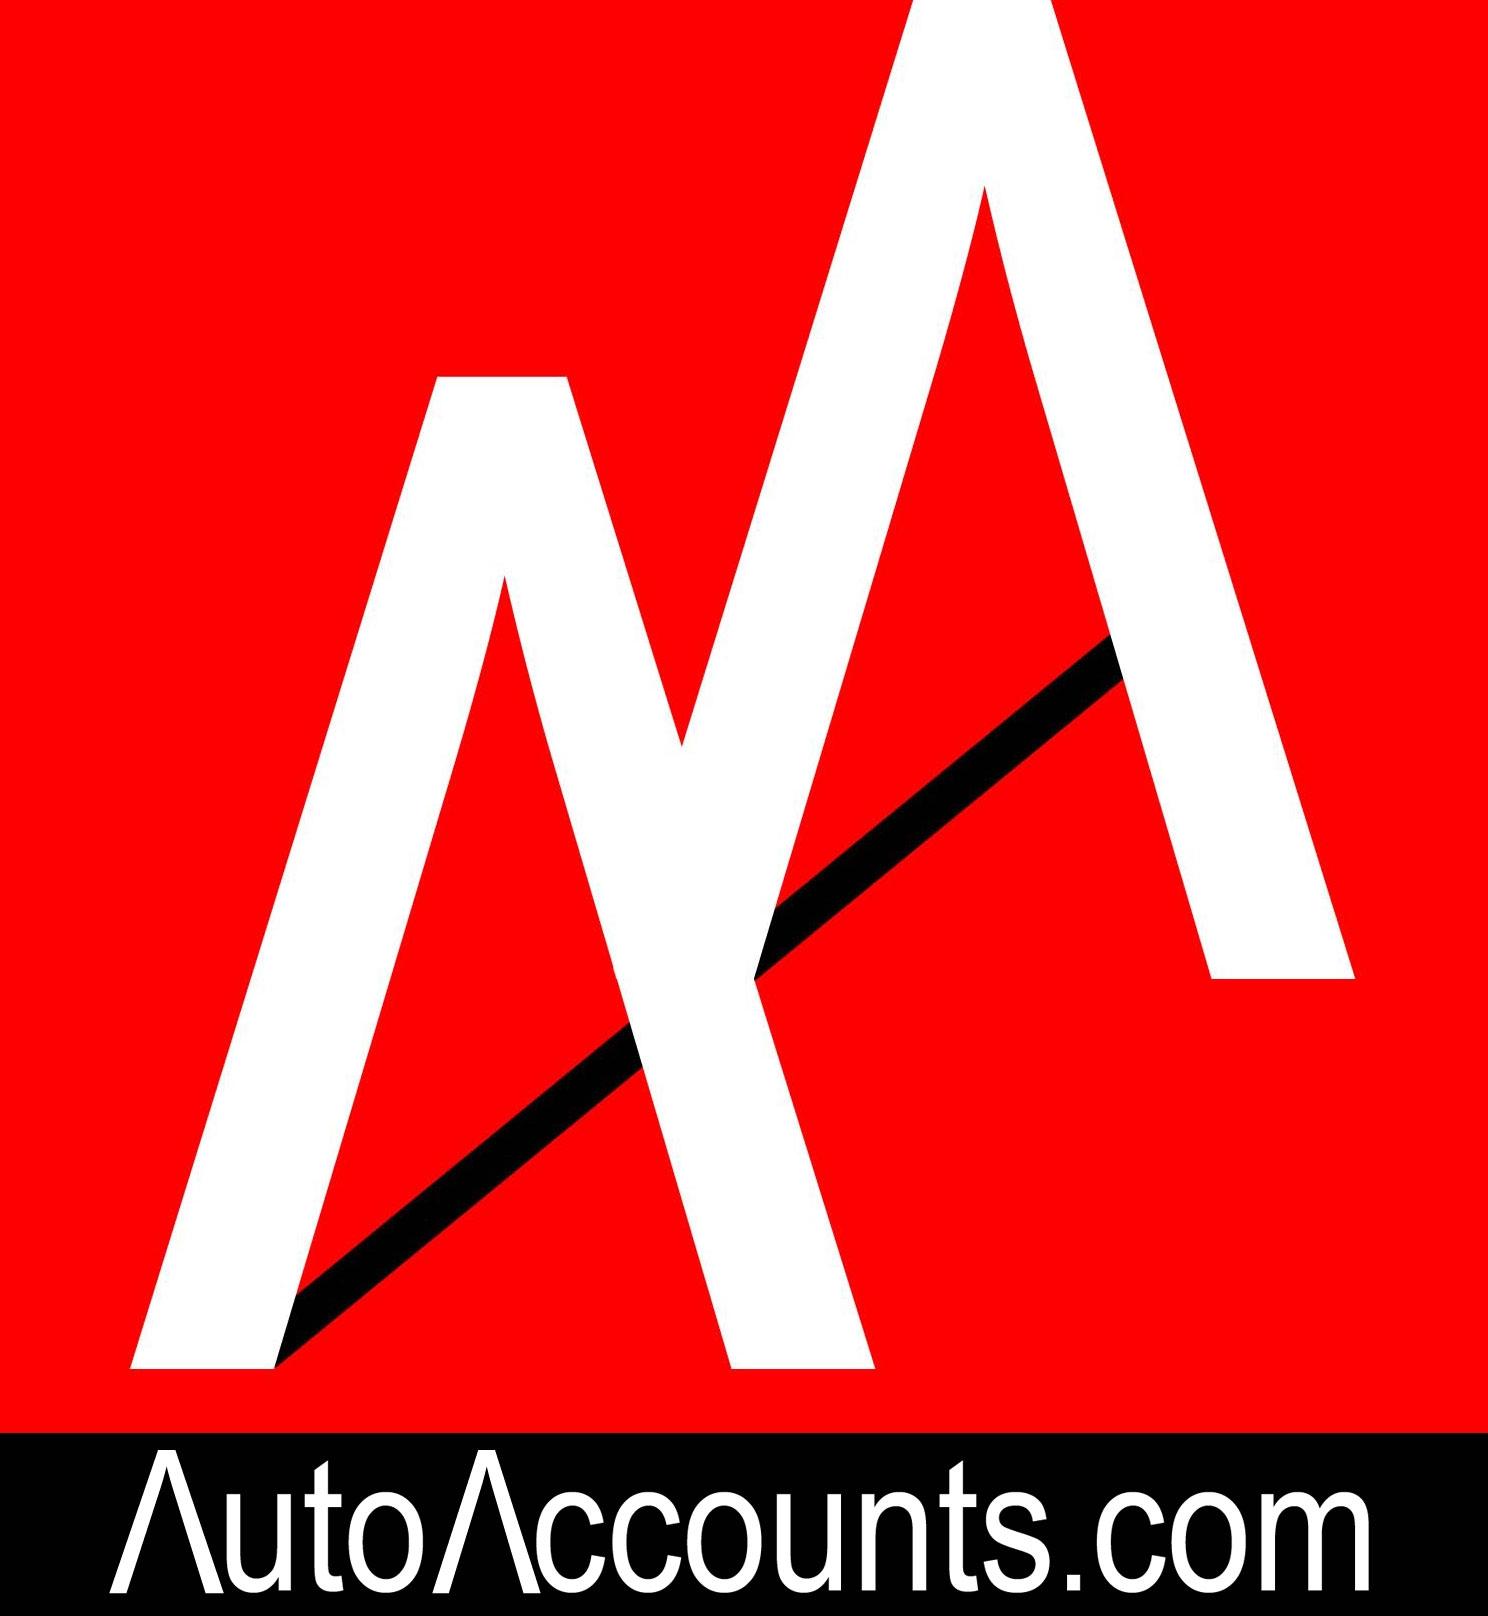 AutoAccounts